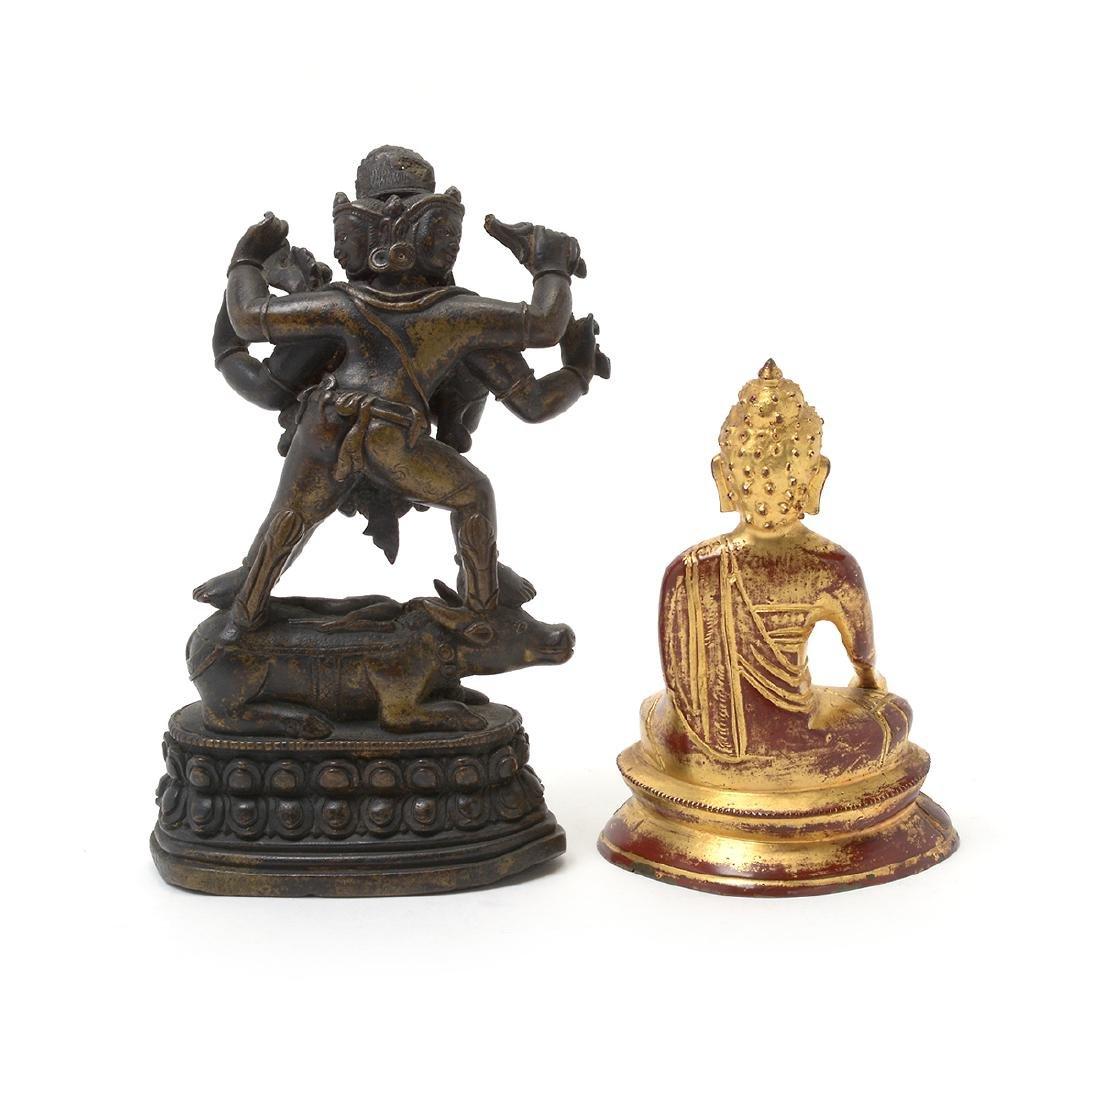 Two Bronze Buddhist Figures, 17th/18th Century - 4